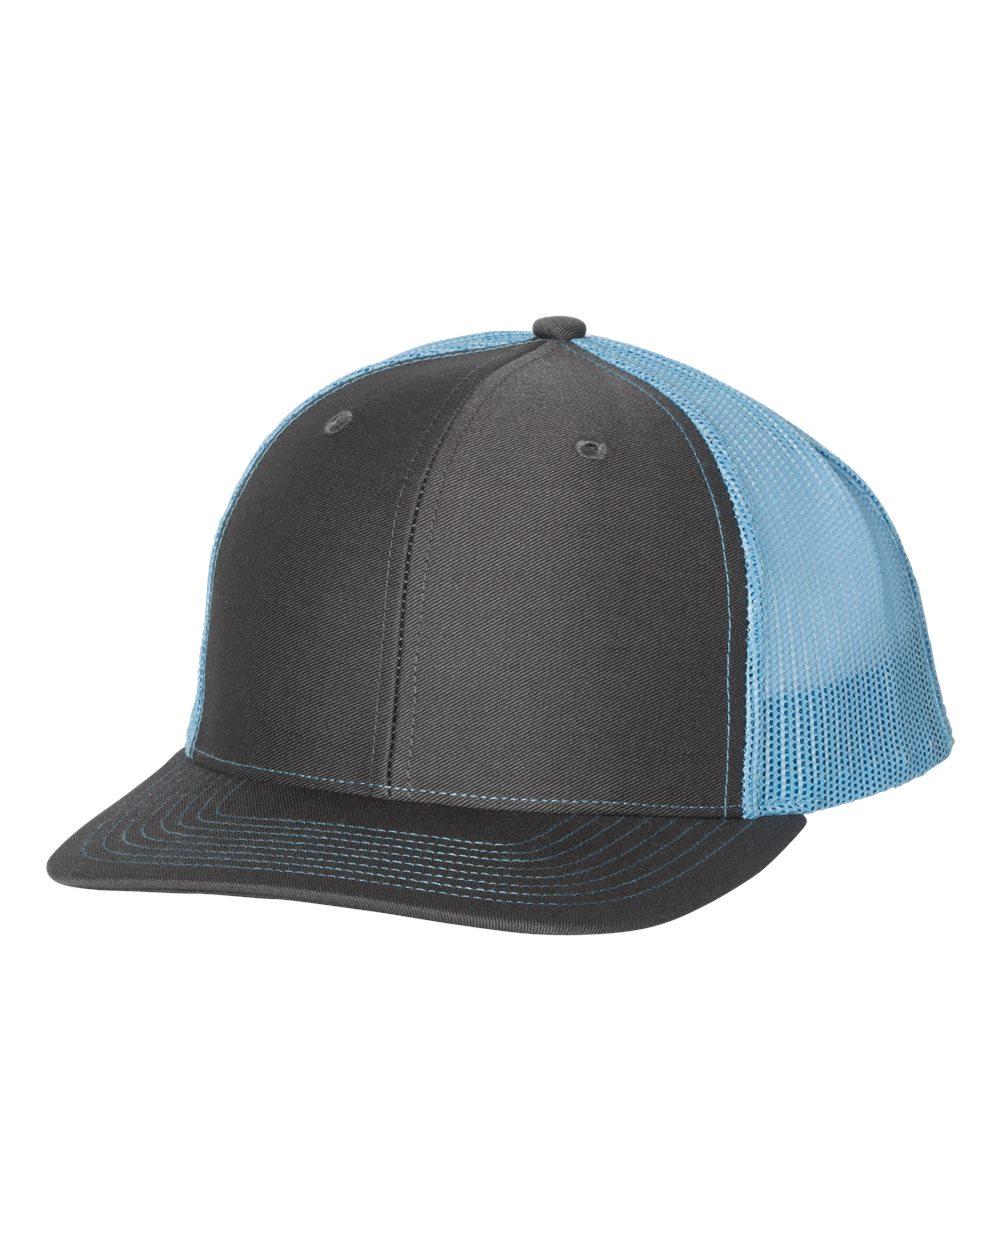 Charcoal / Columbia Blue